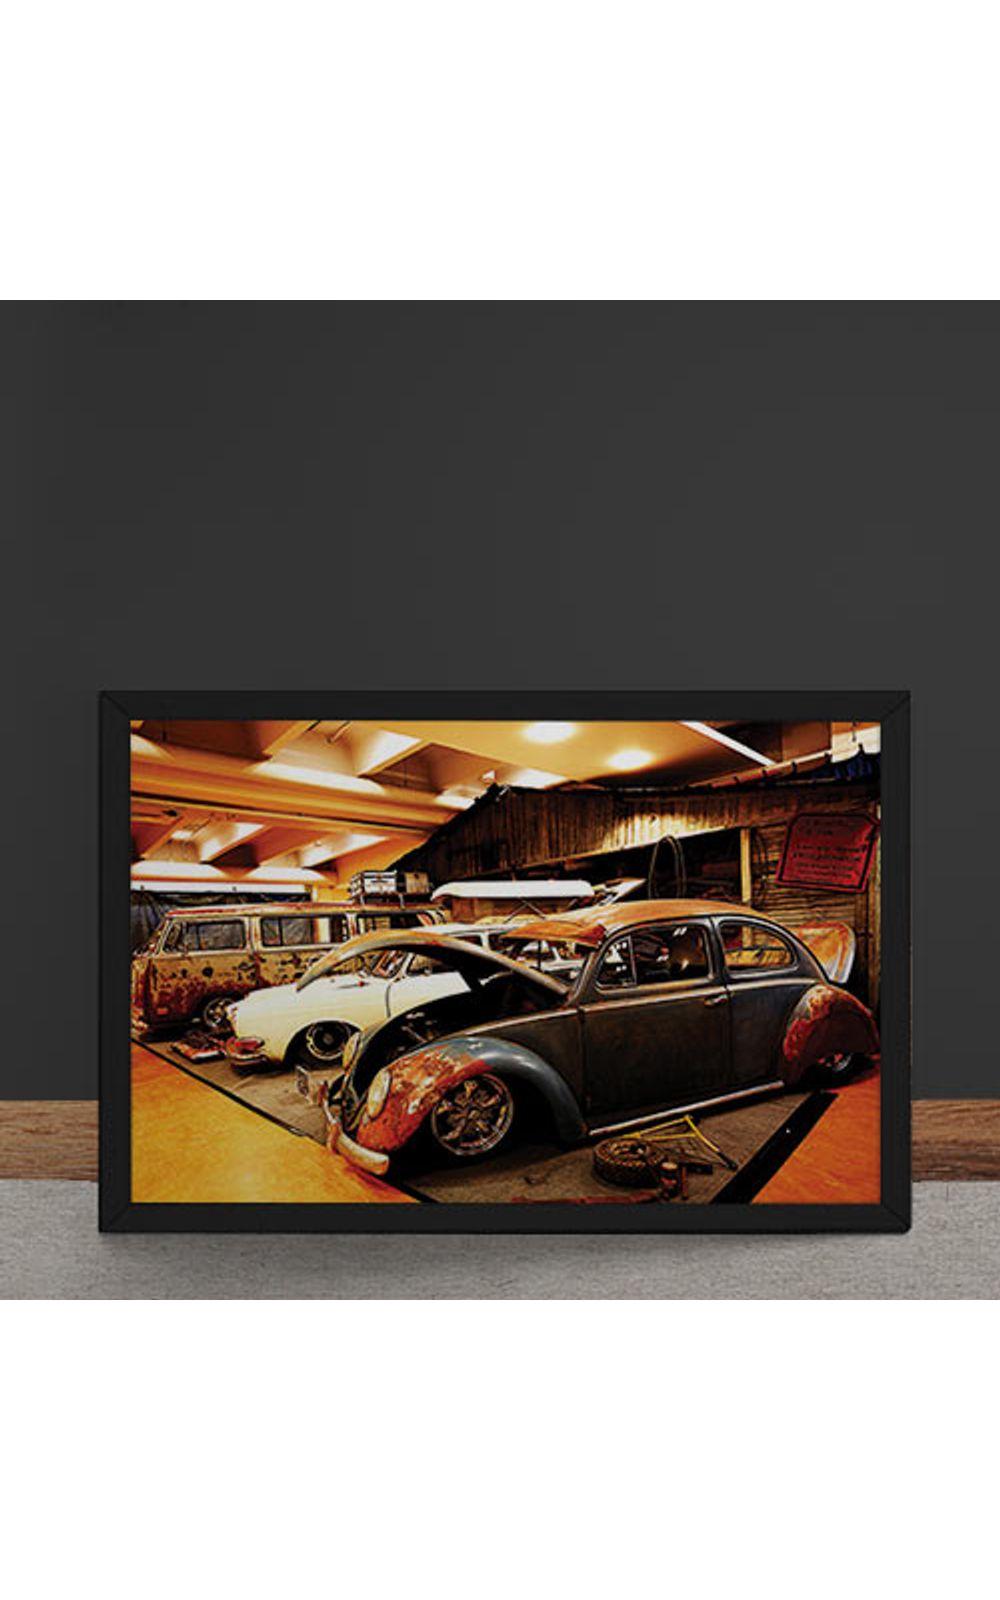 Foto 4 - Quadro Decorativo Carro Volkswagen Rat Look